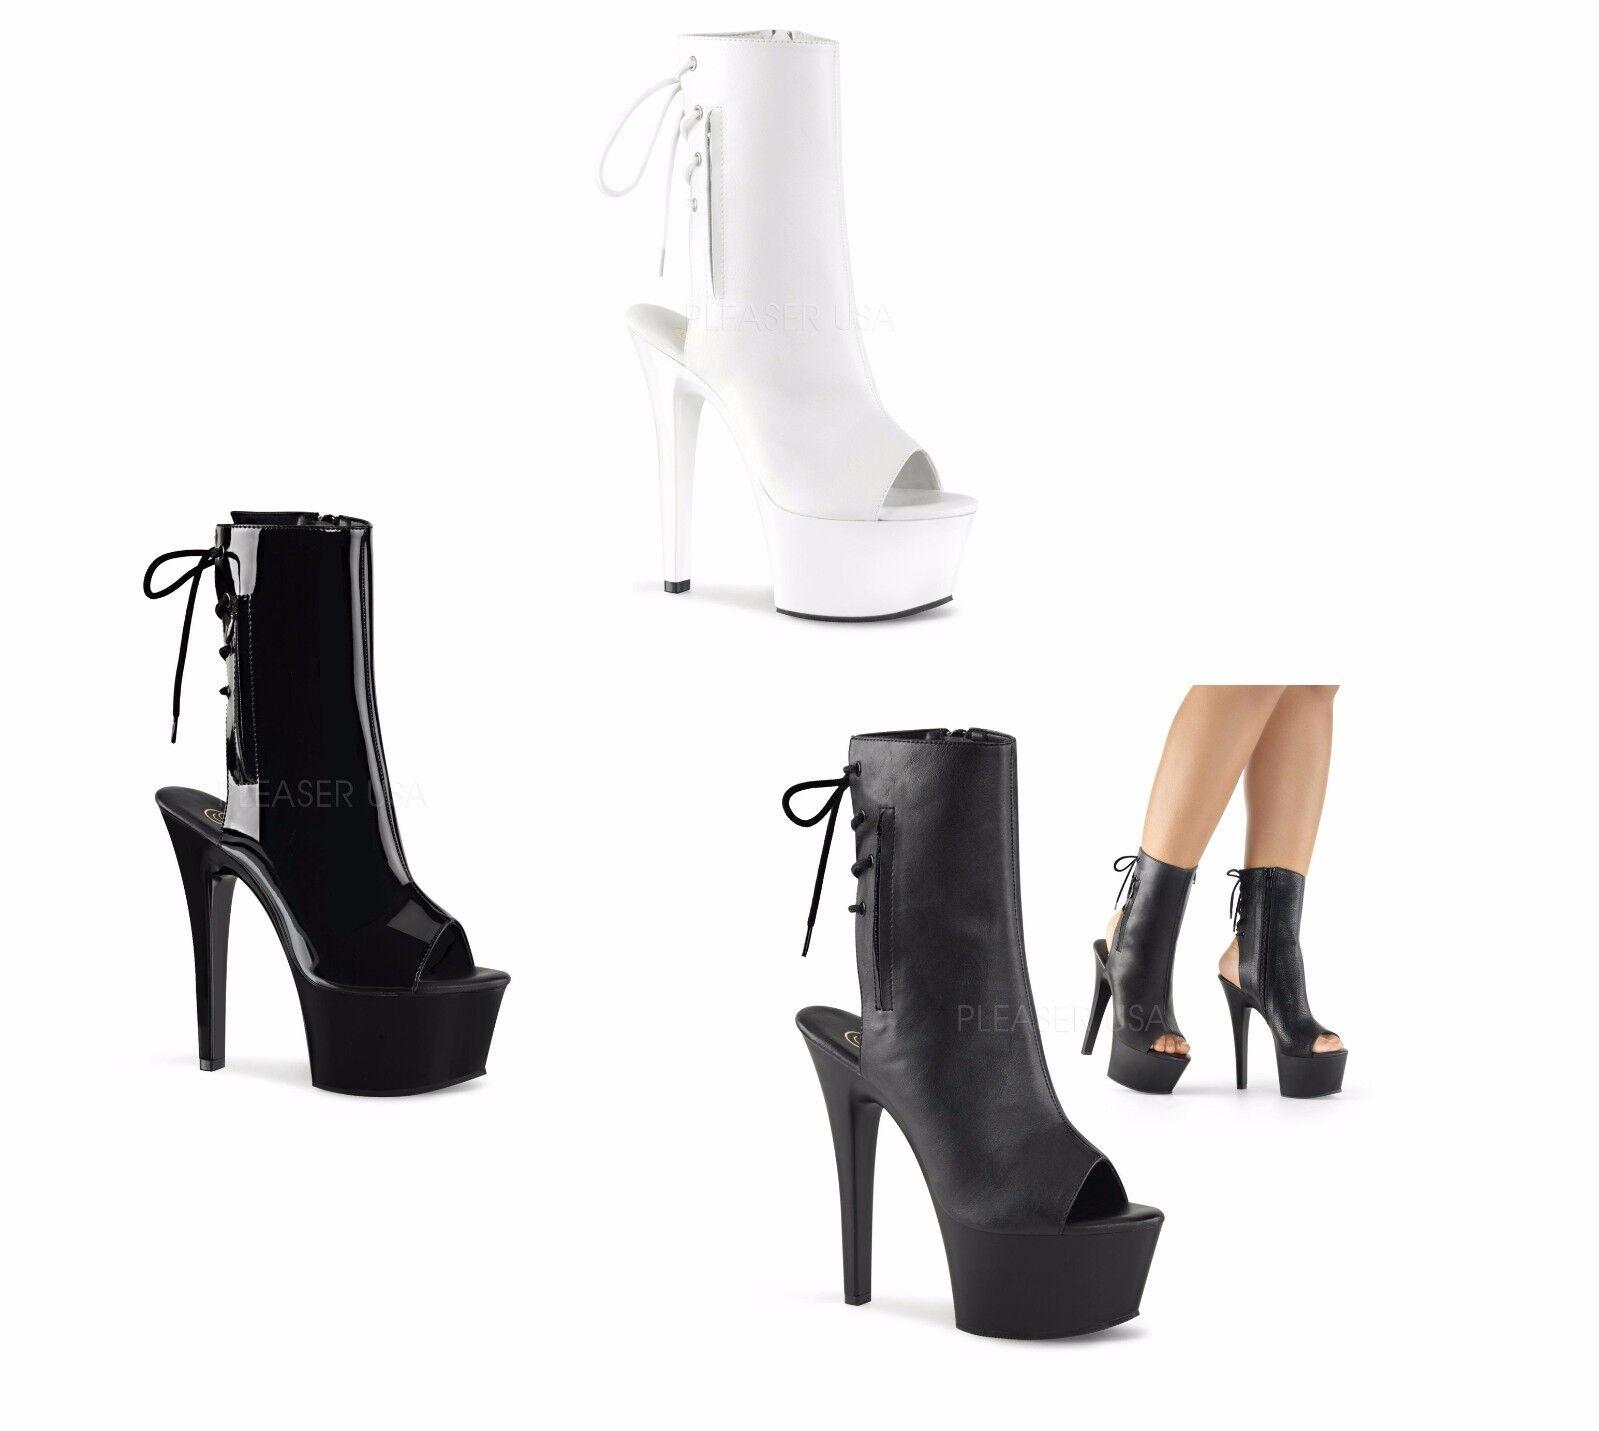 PLEASER ASPIRE-1018 Exotic Dancing Platform Ankle Boot